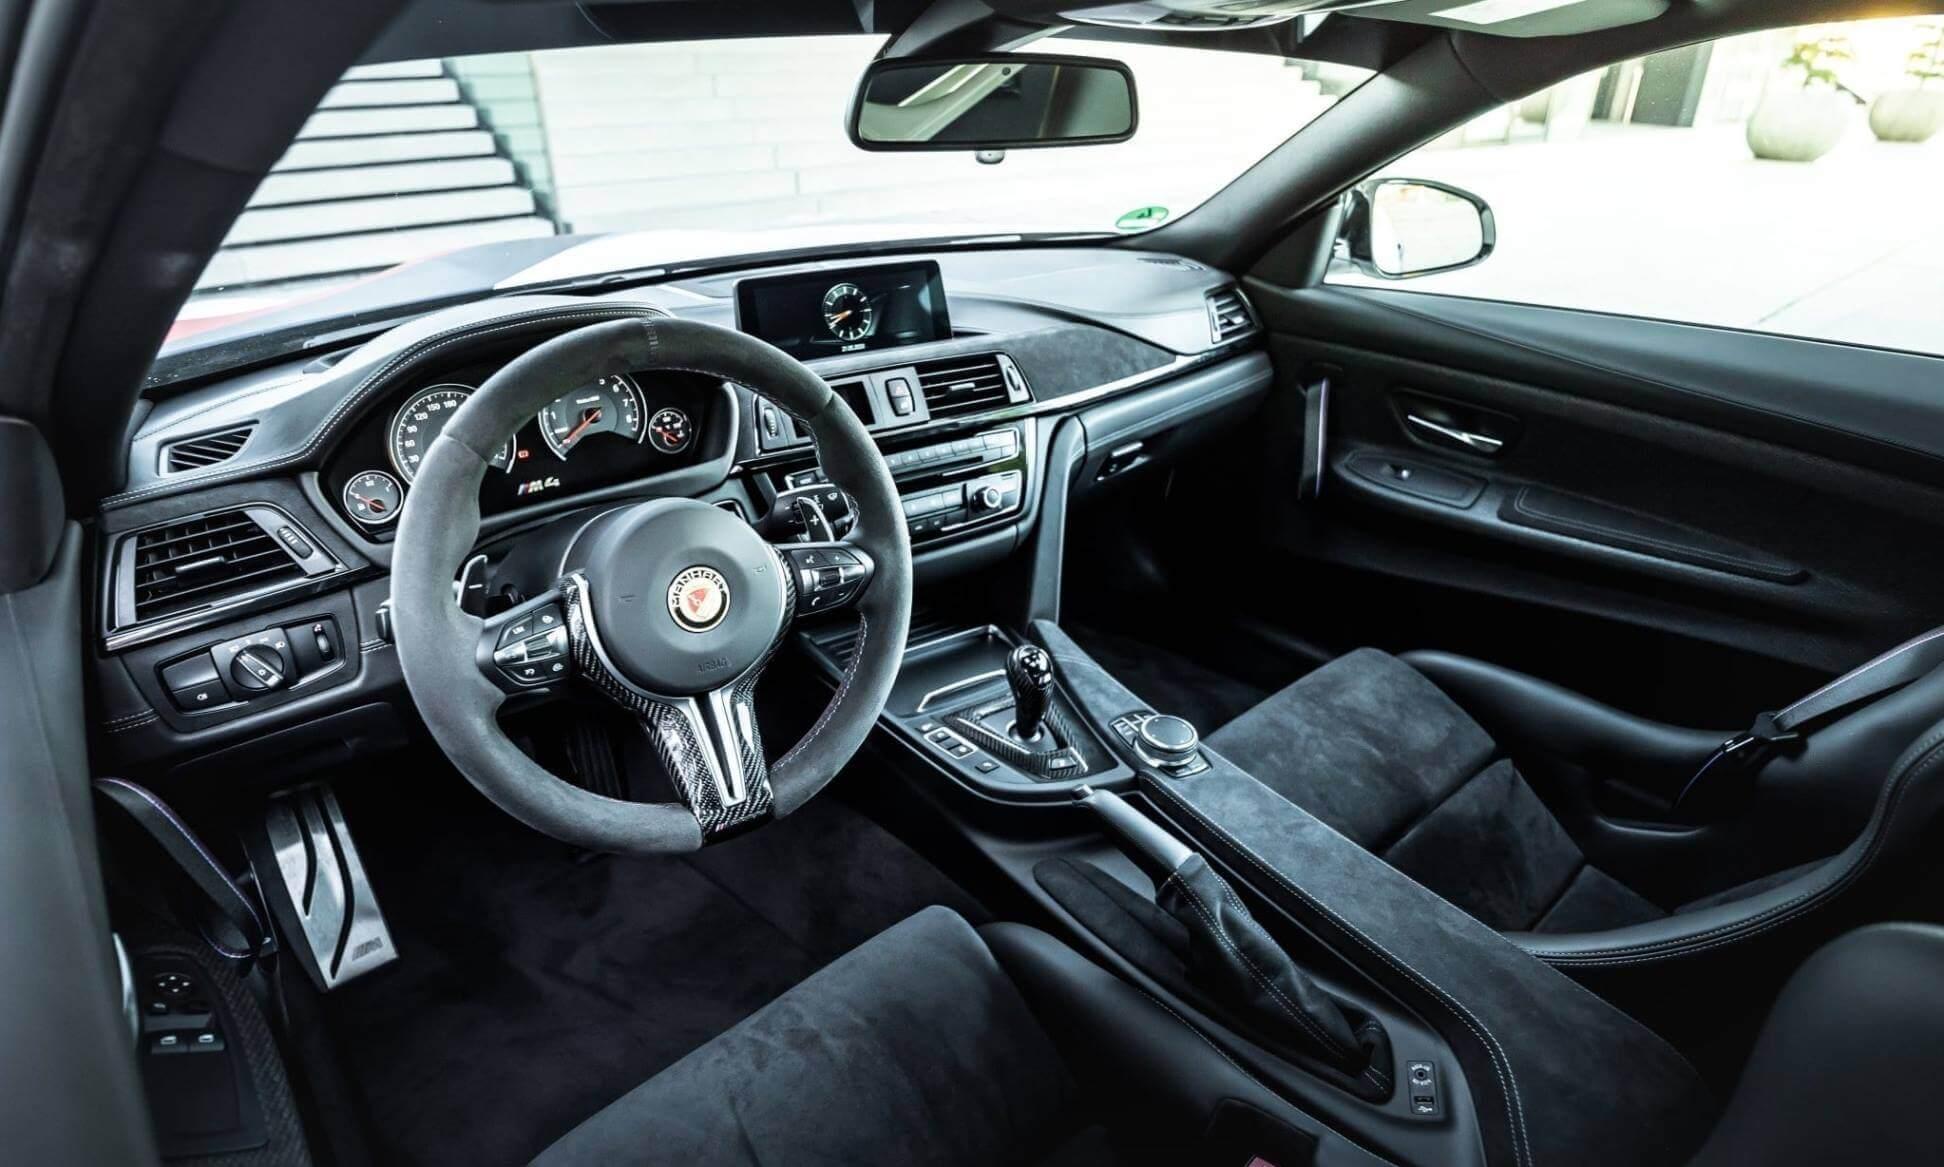 Manhart MH4 GTR interior